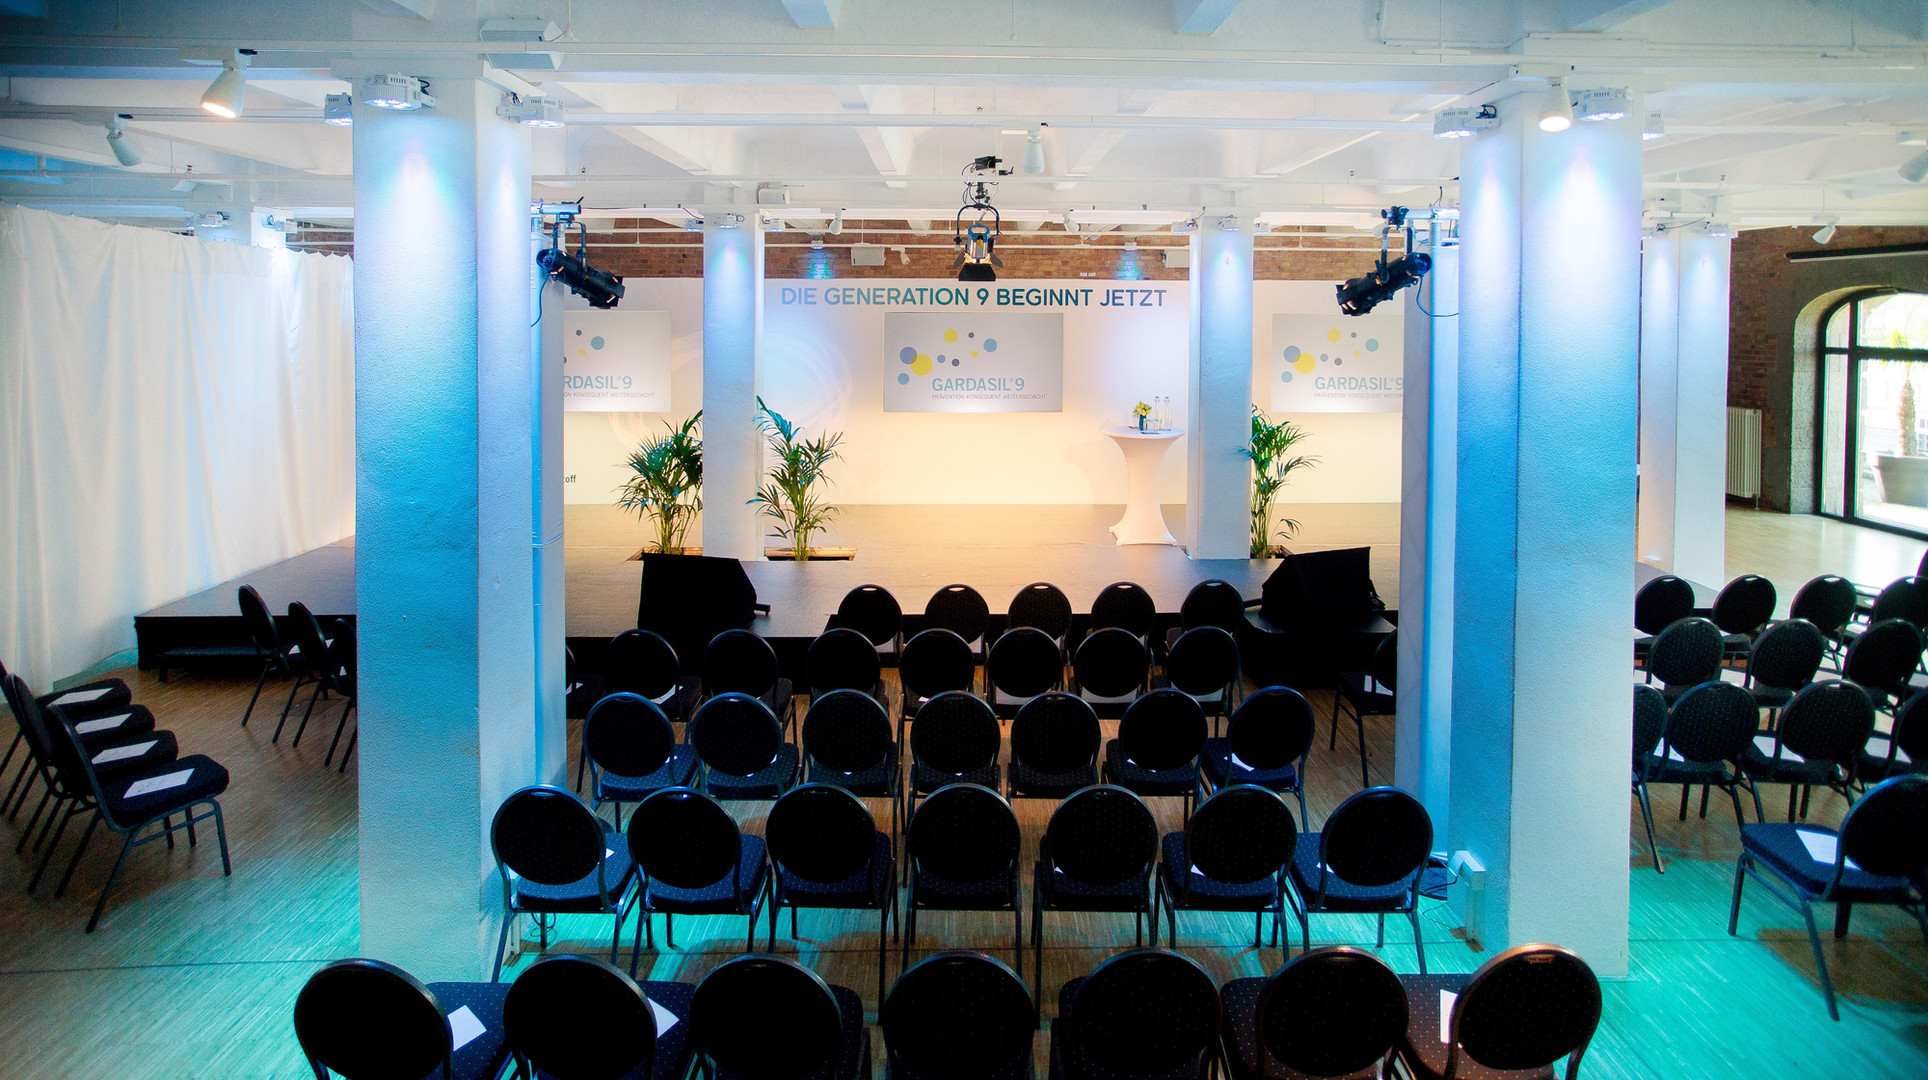 005-030-eventloft-konferenz-beleuchtet.j